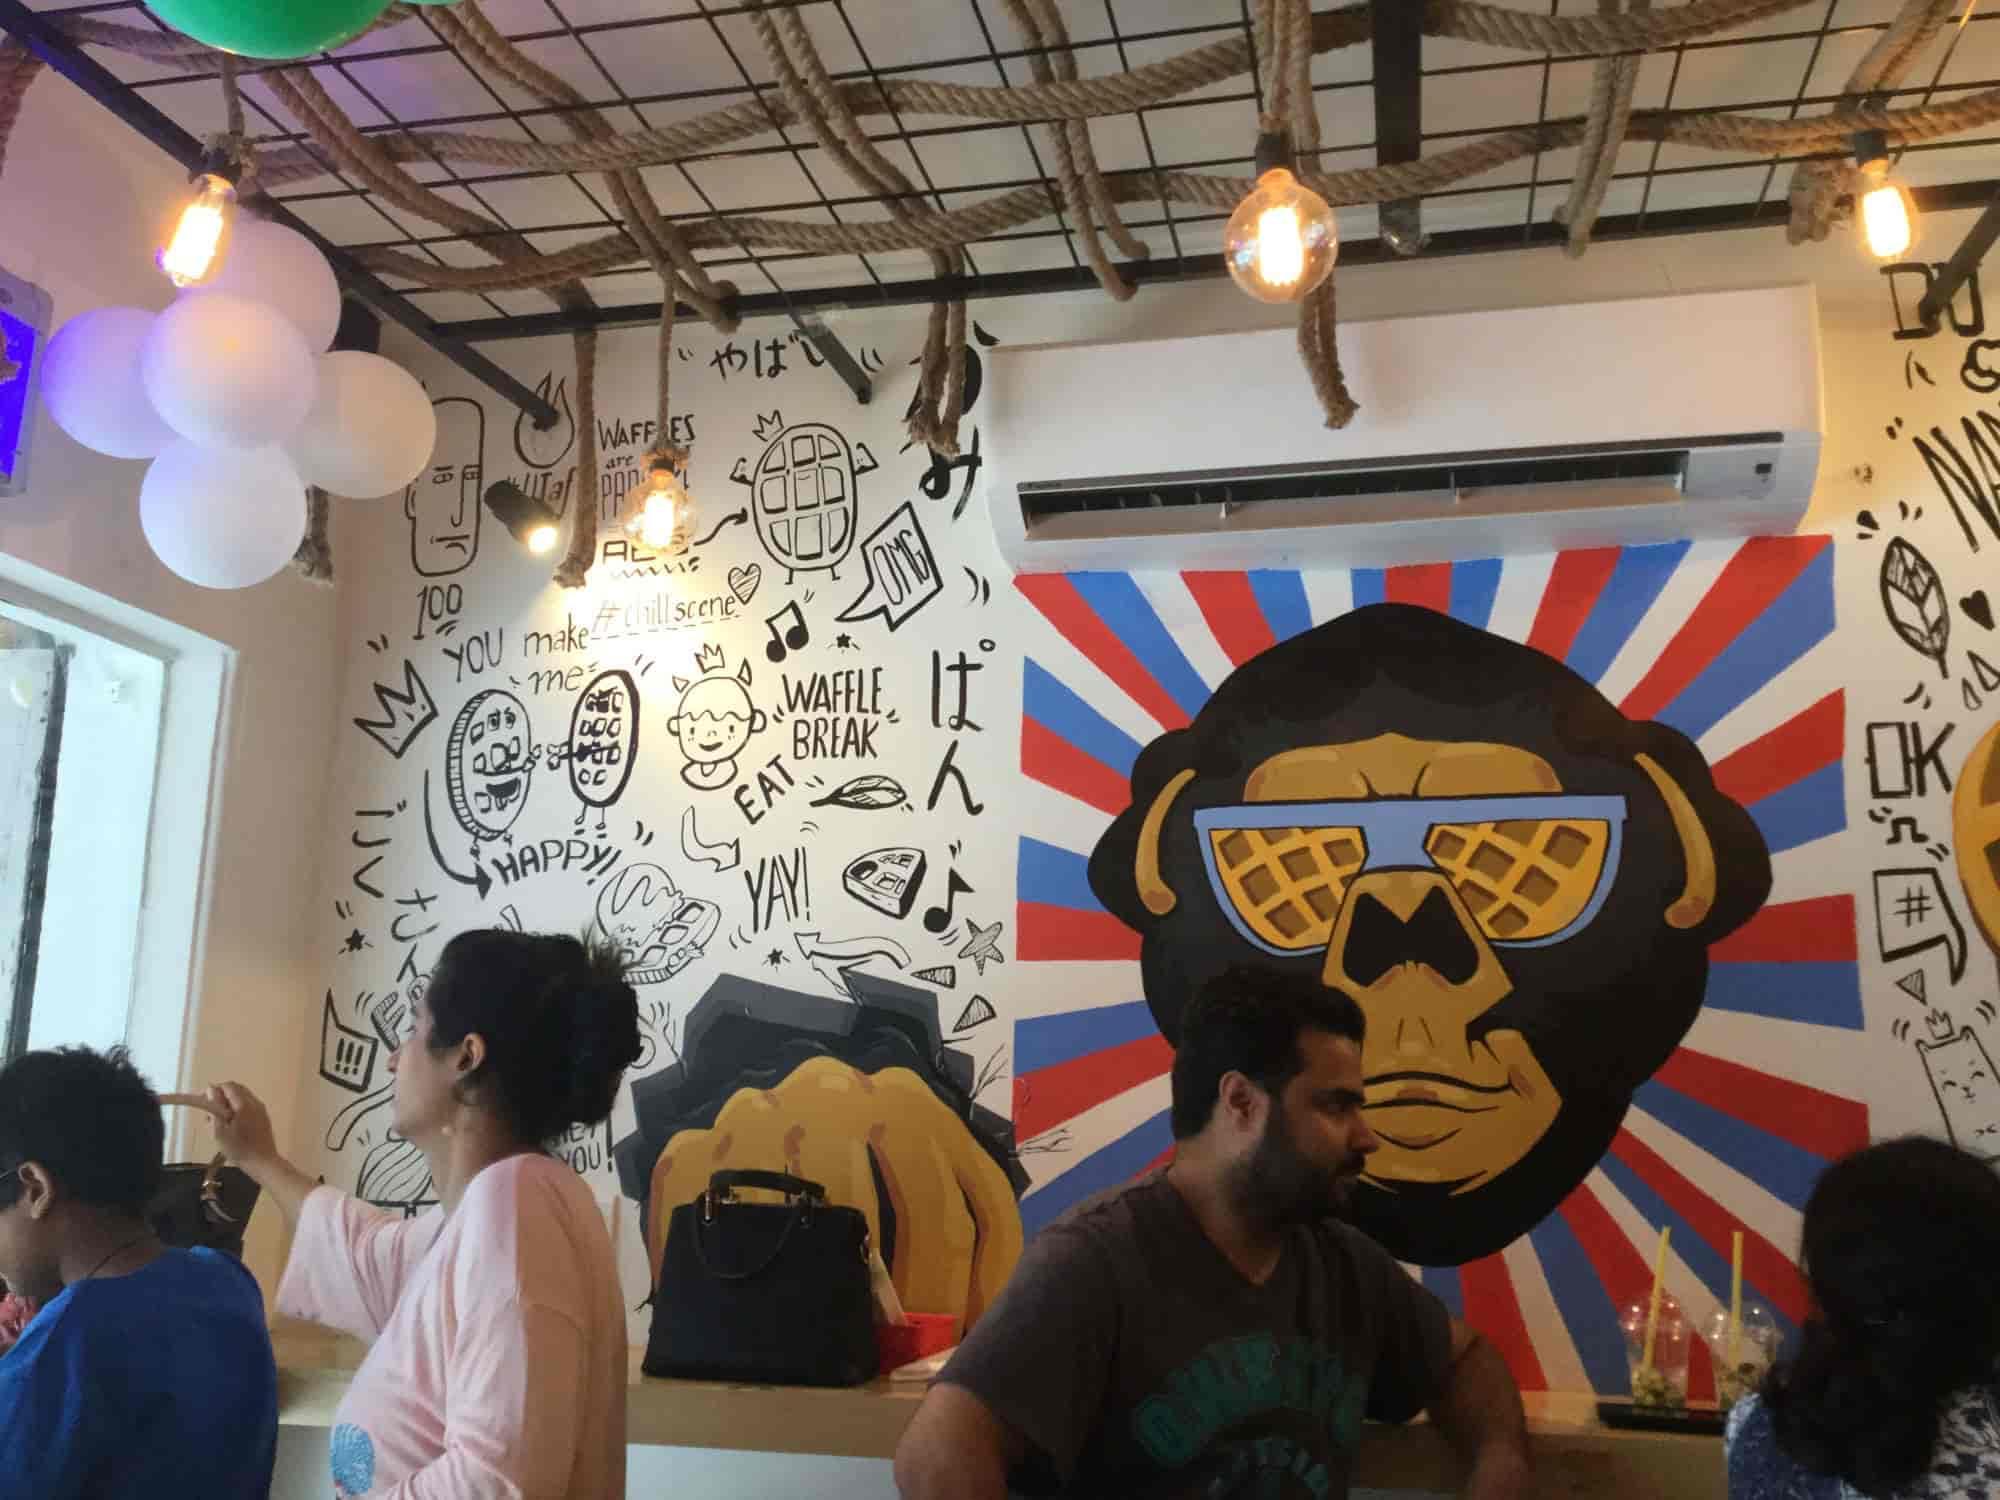 waffle-king-pitampura-delhi-bakeries-1ppn4xw.jpg (2000×1500)